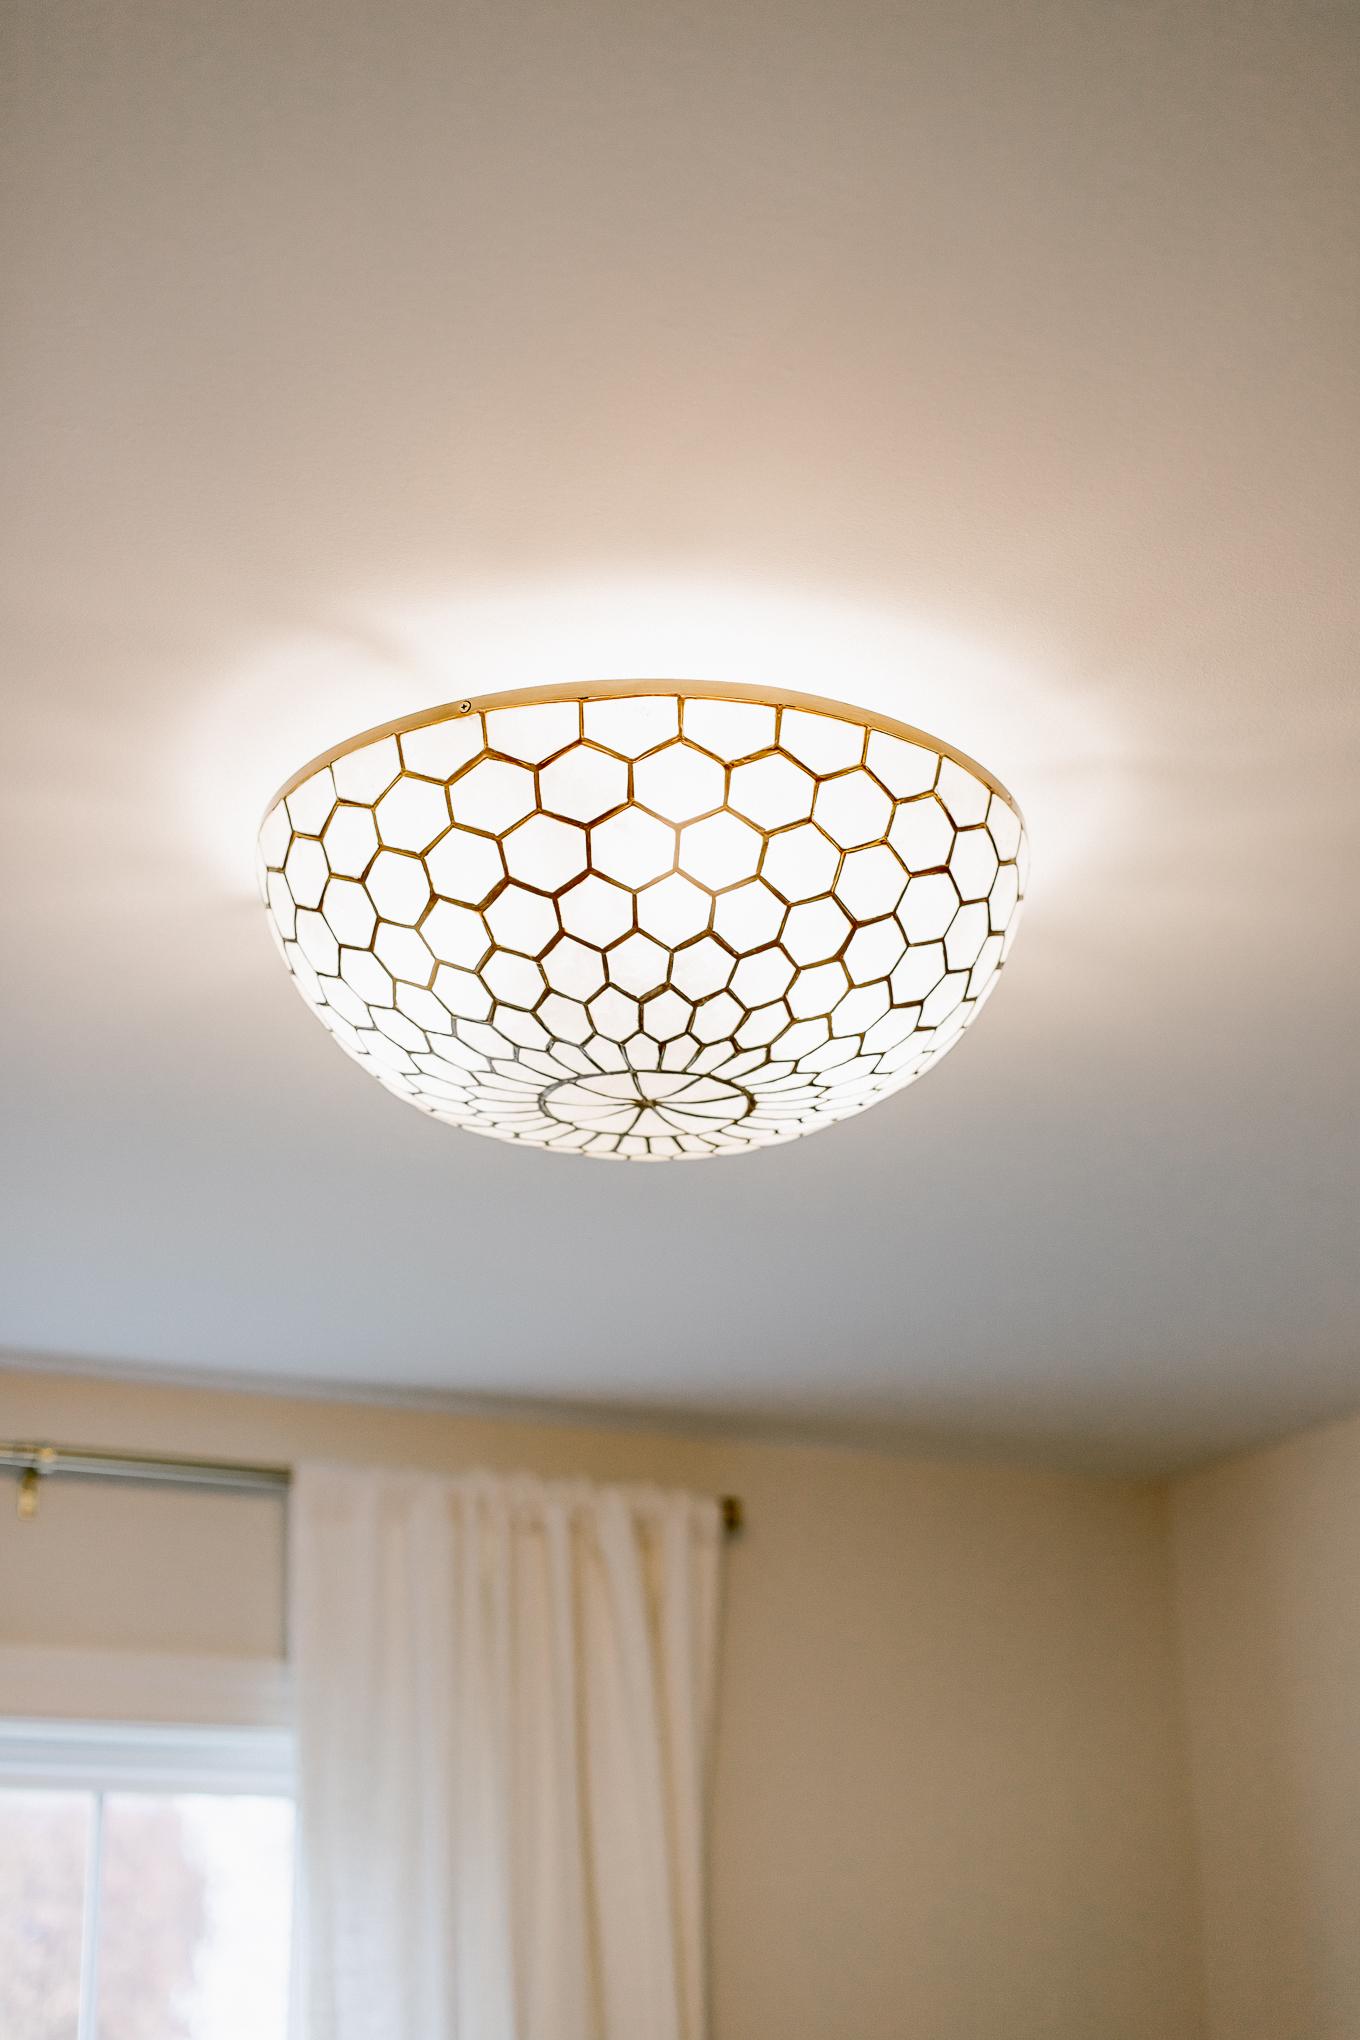 BEAUTIFUL Flush Mount Light, Prettiest Flush Mount for Bedroom or Bathroom | Louella Reese